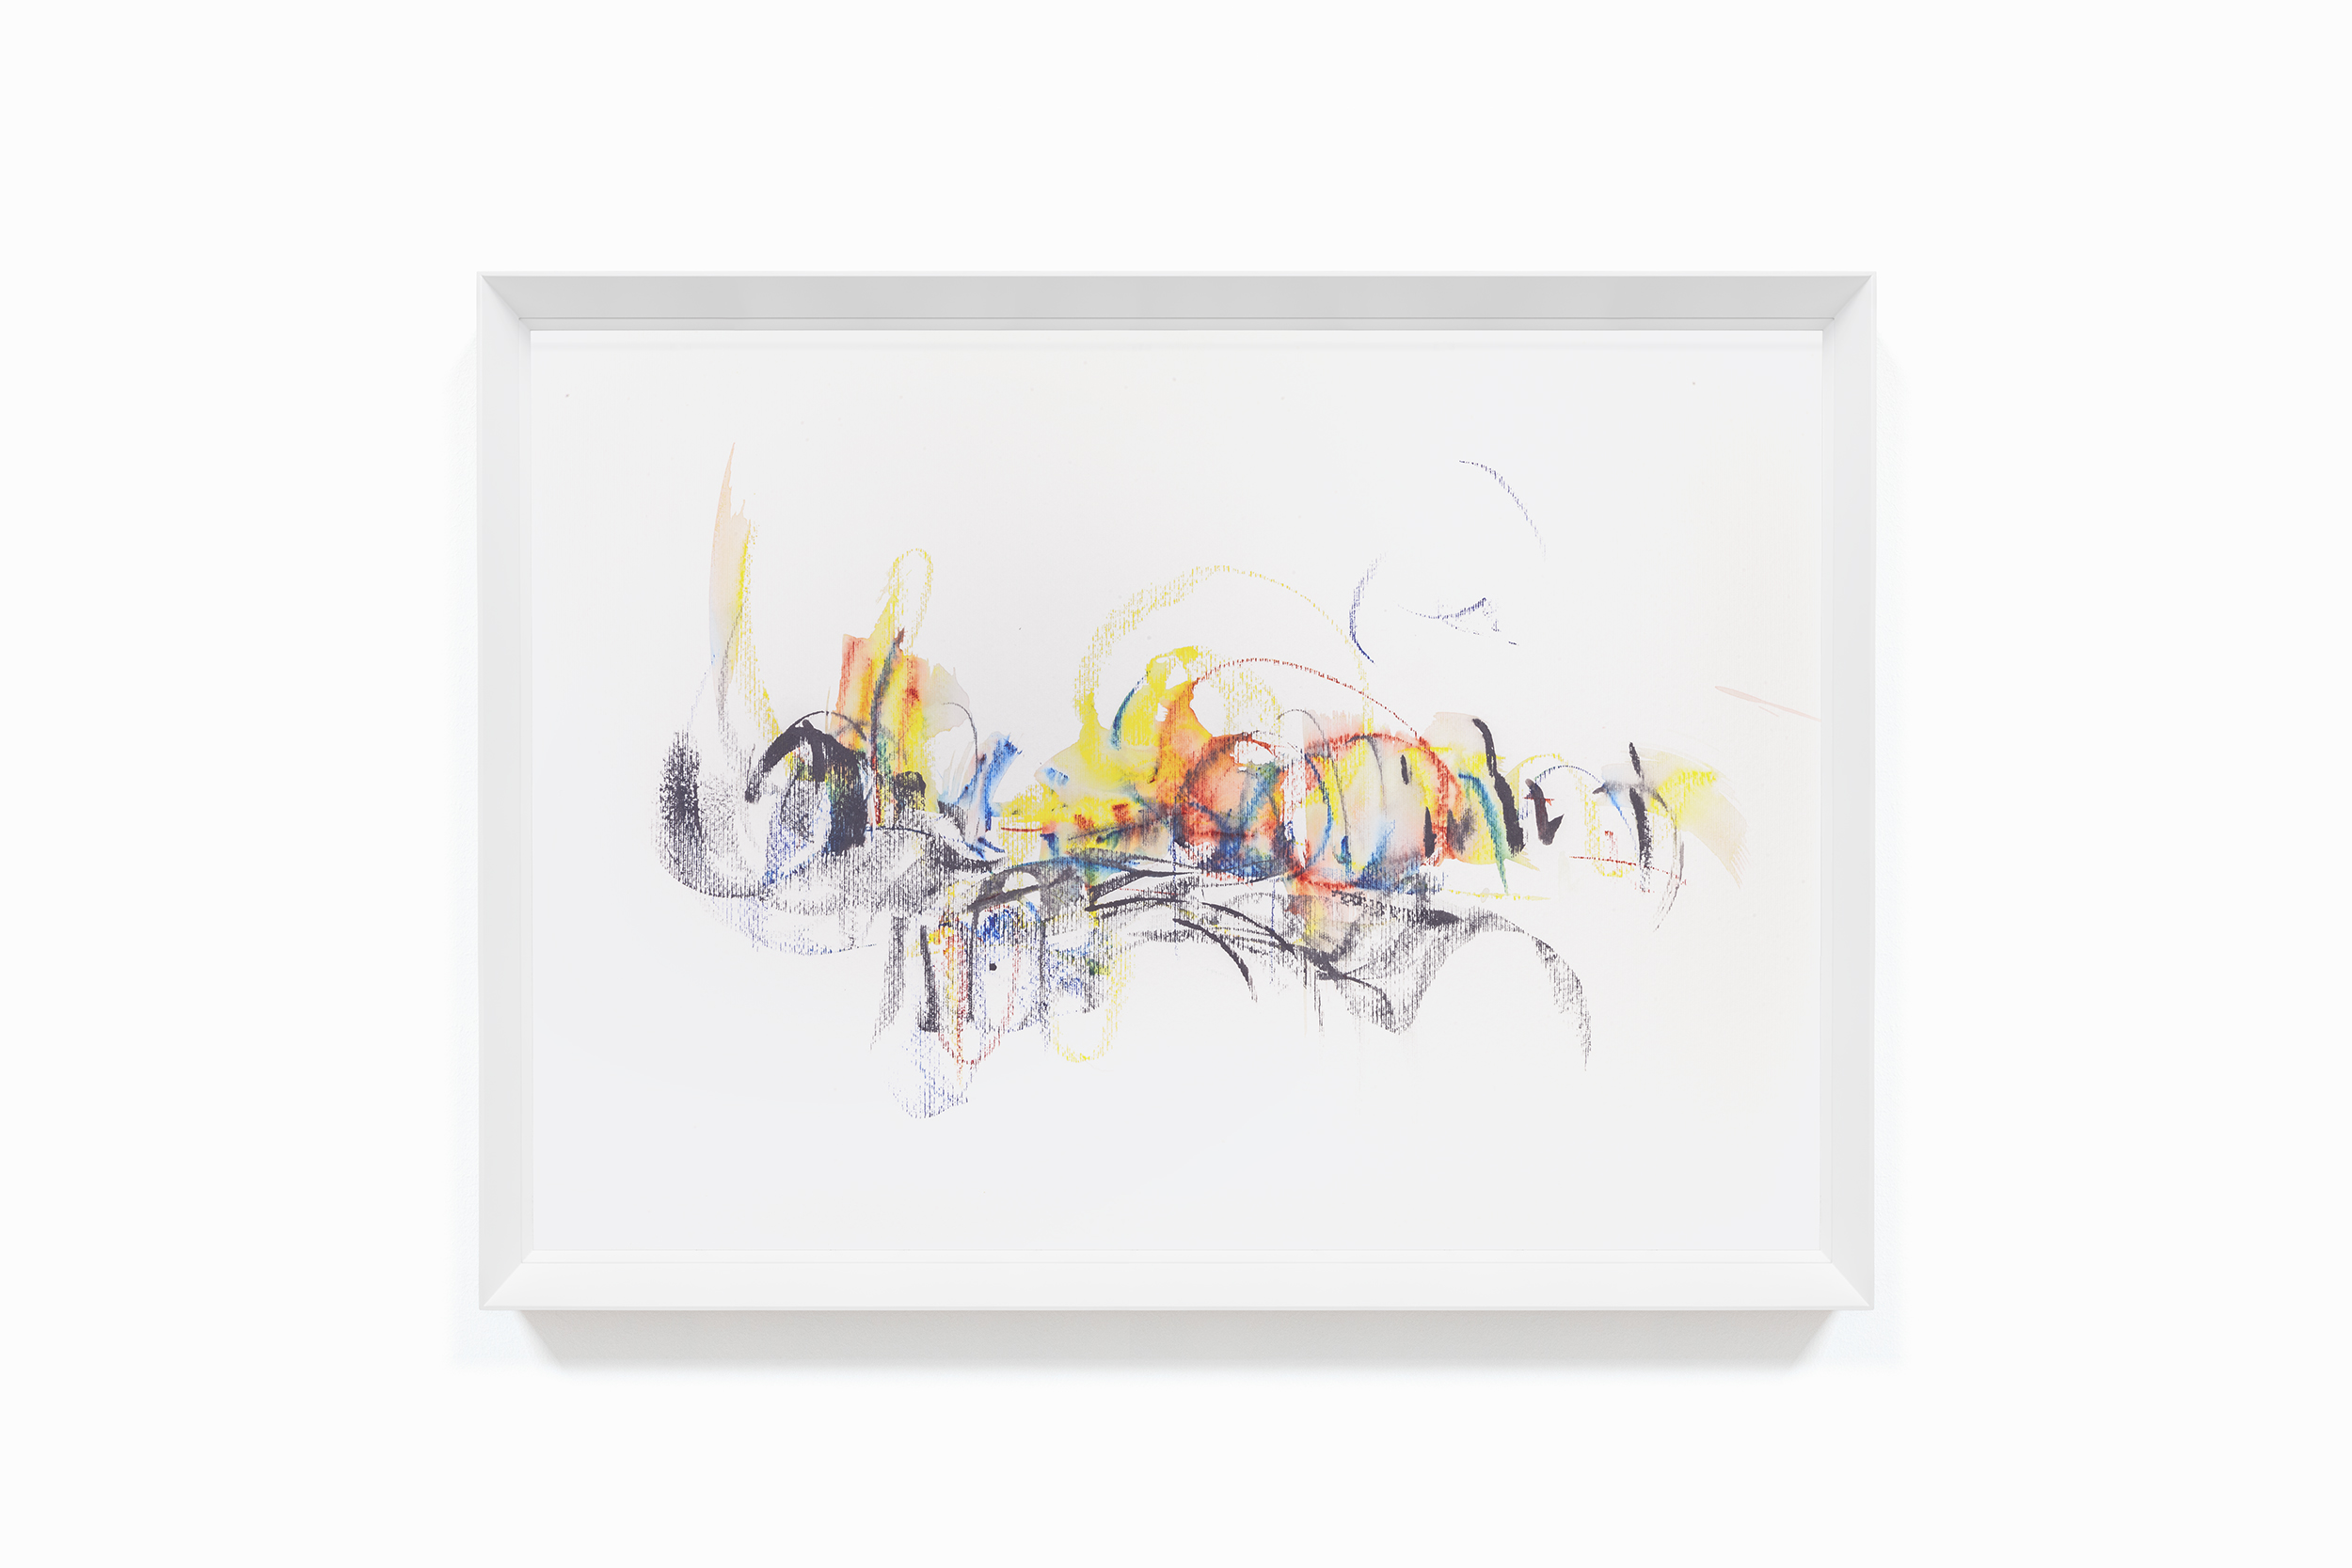 156 Andre Gigante Pintura Painting bonjourmolotov La.jpg